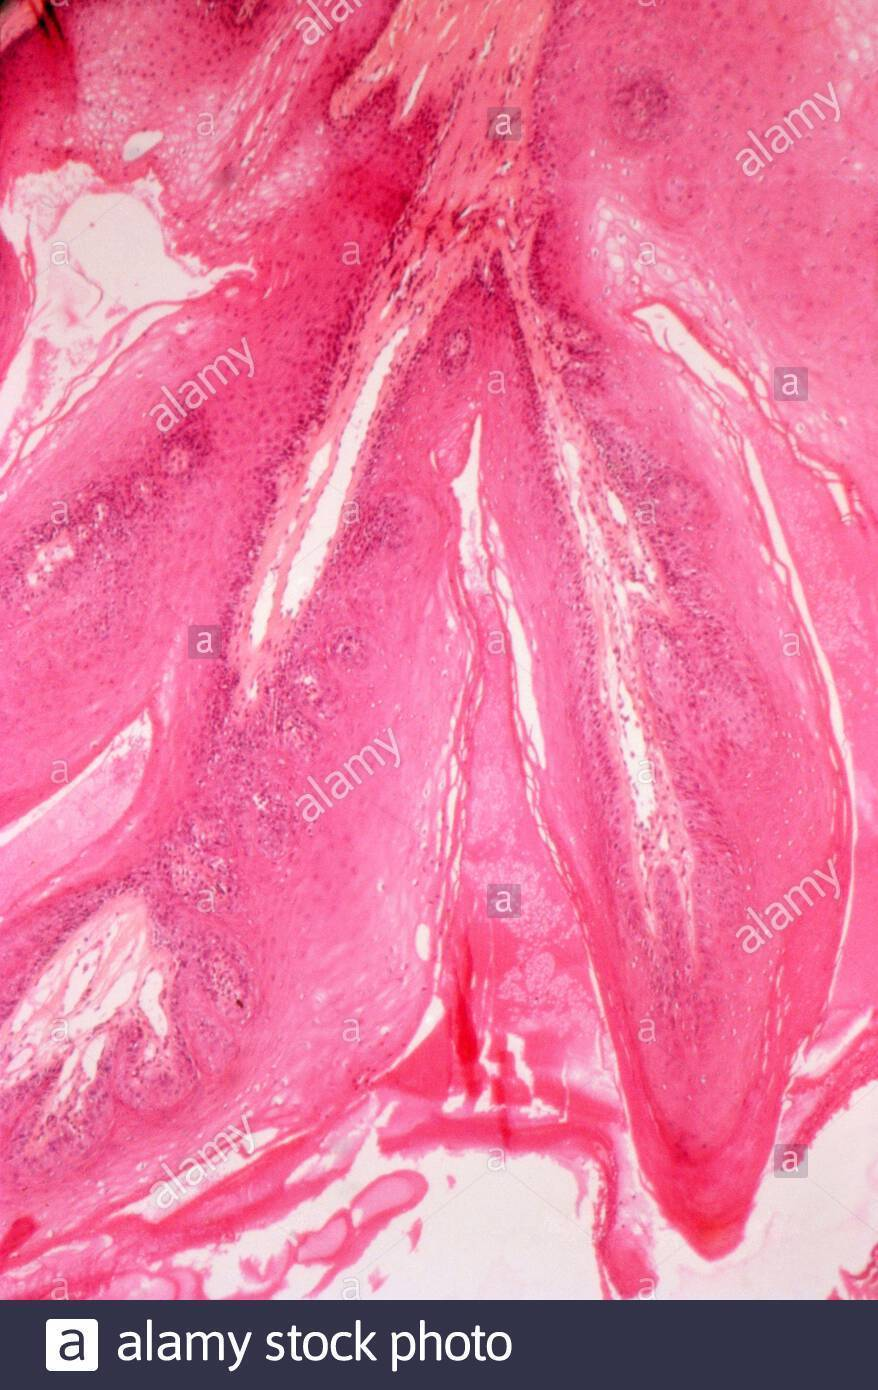 папиллома на миндалине